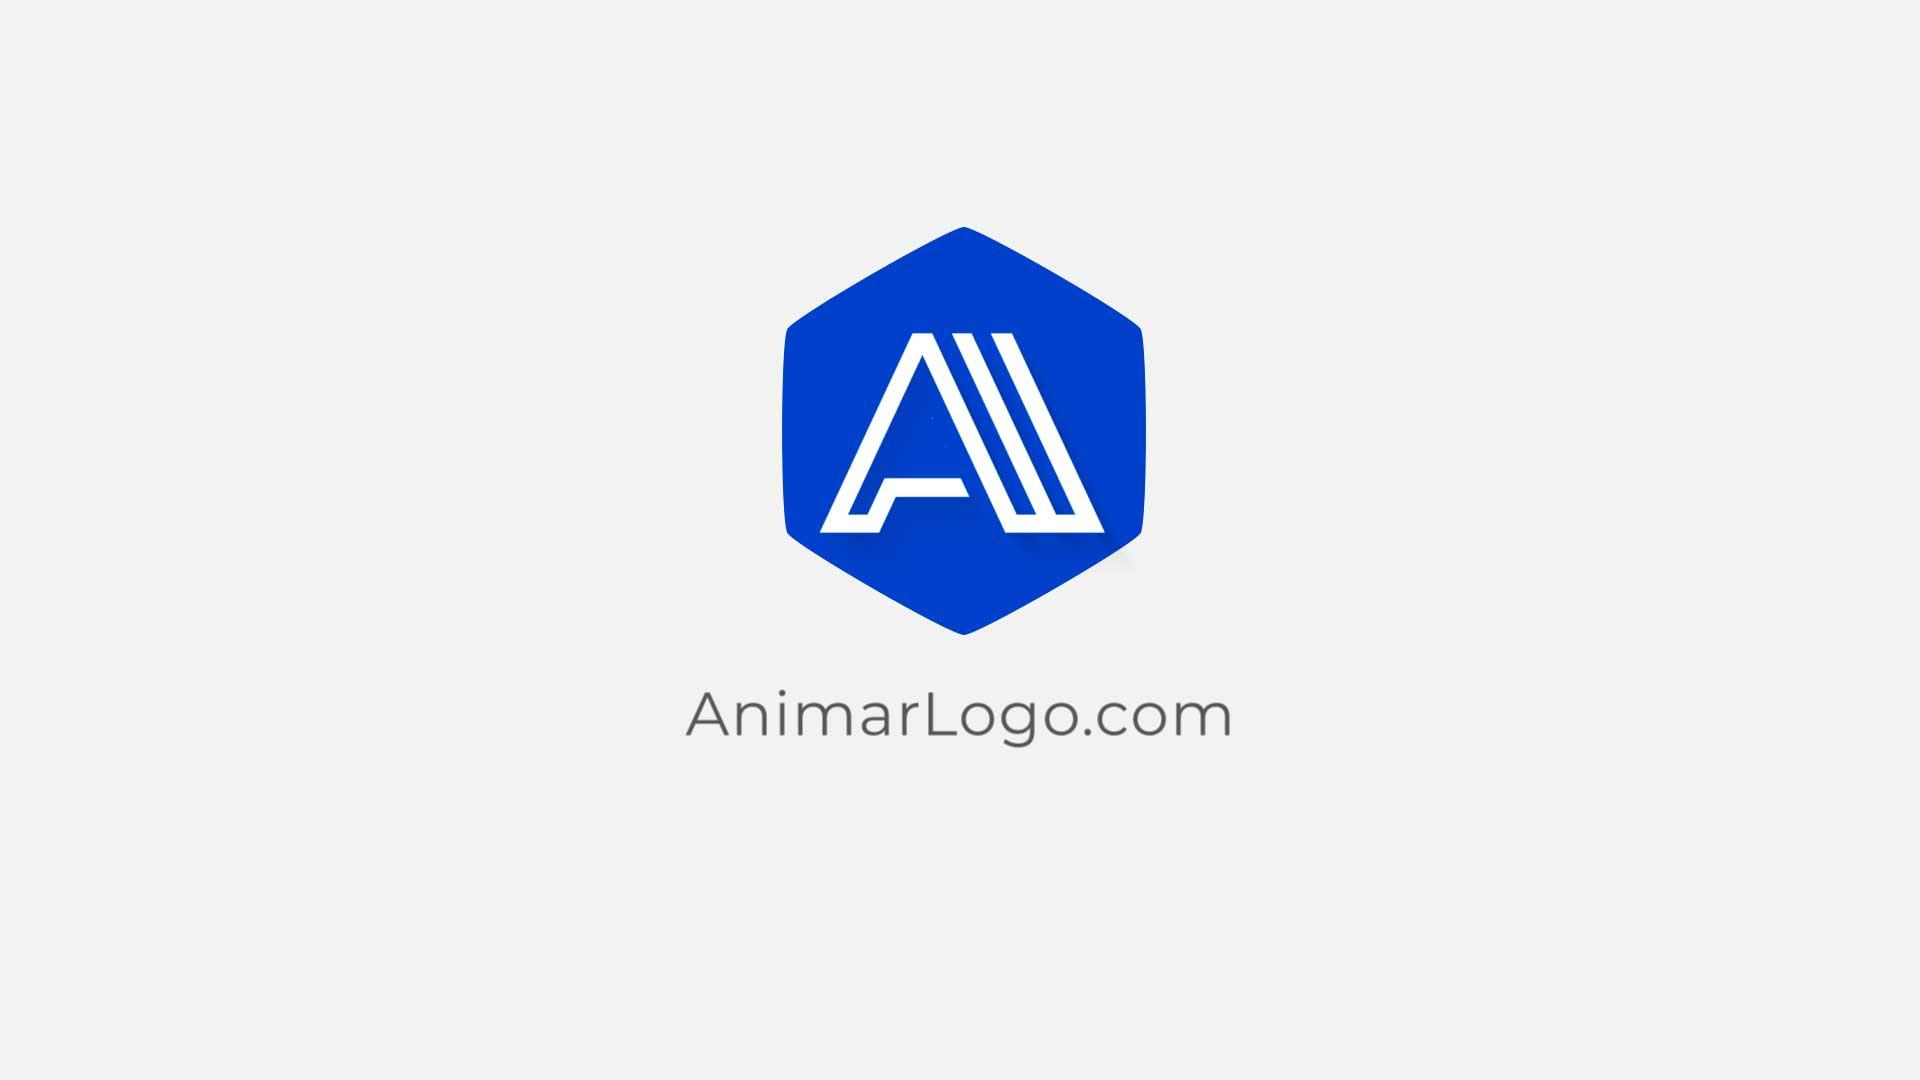 Logo-animado-Minimalista-AL105-imagen-animarlogo